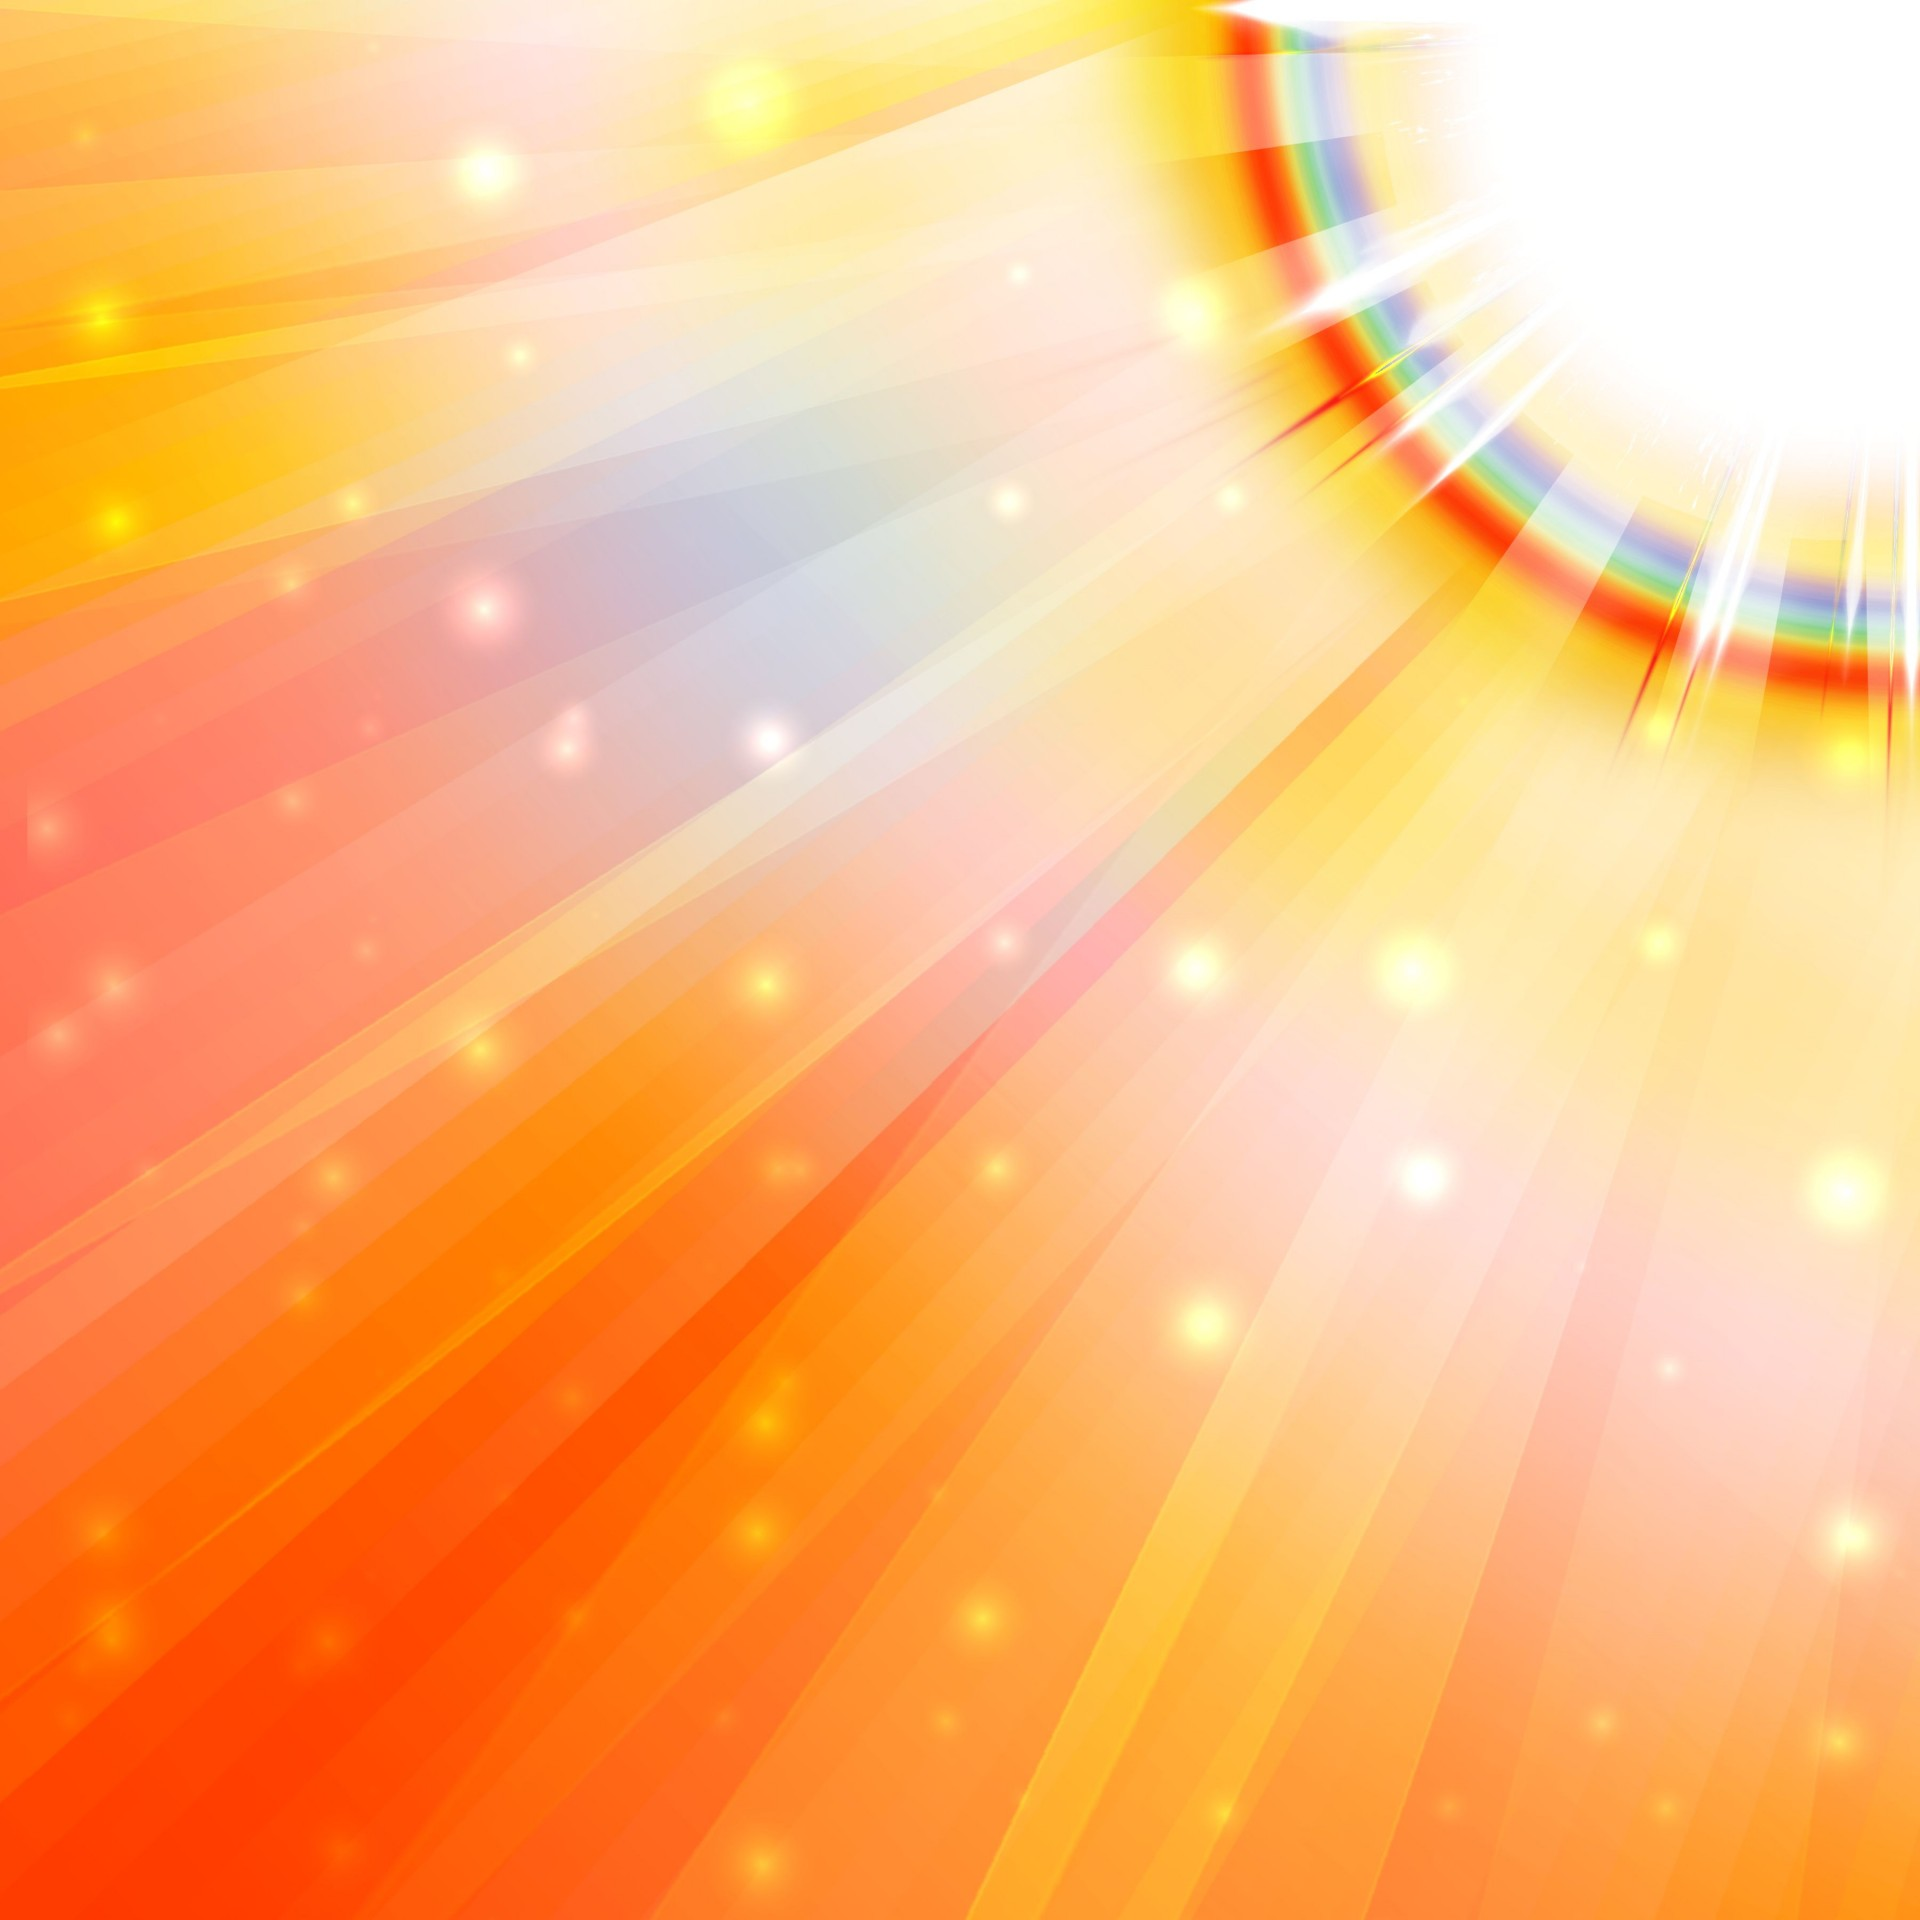 Clip Art Sun Rays 3 Free Stock Photo.